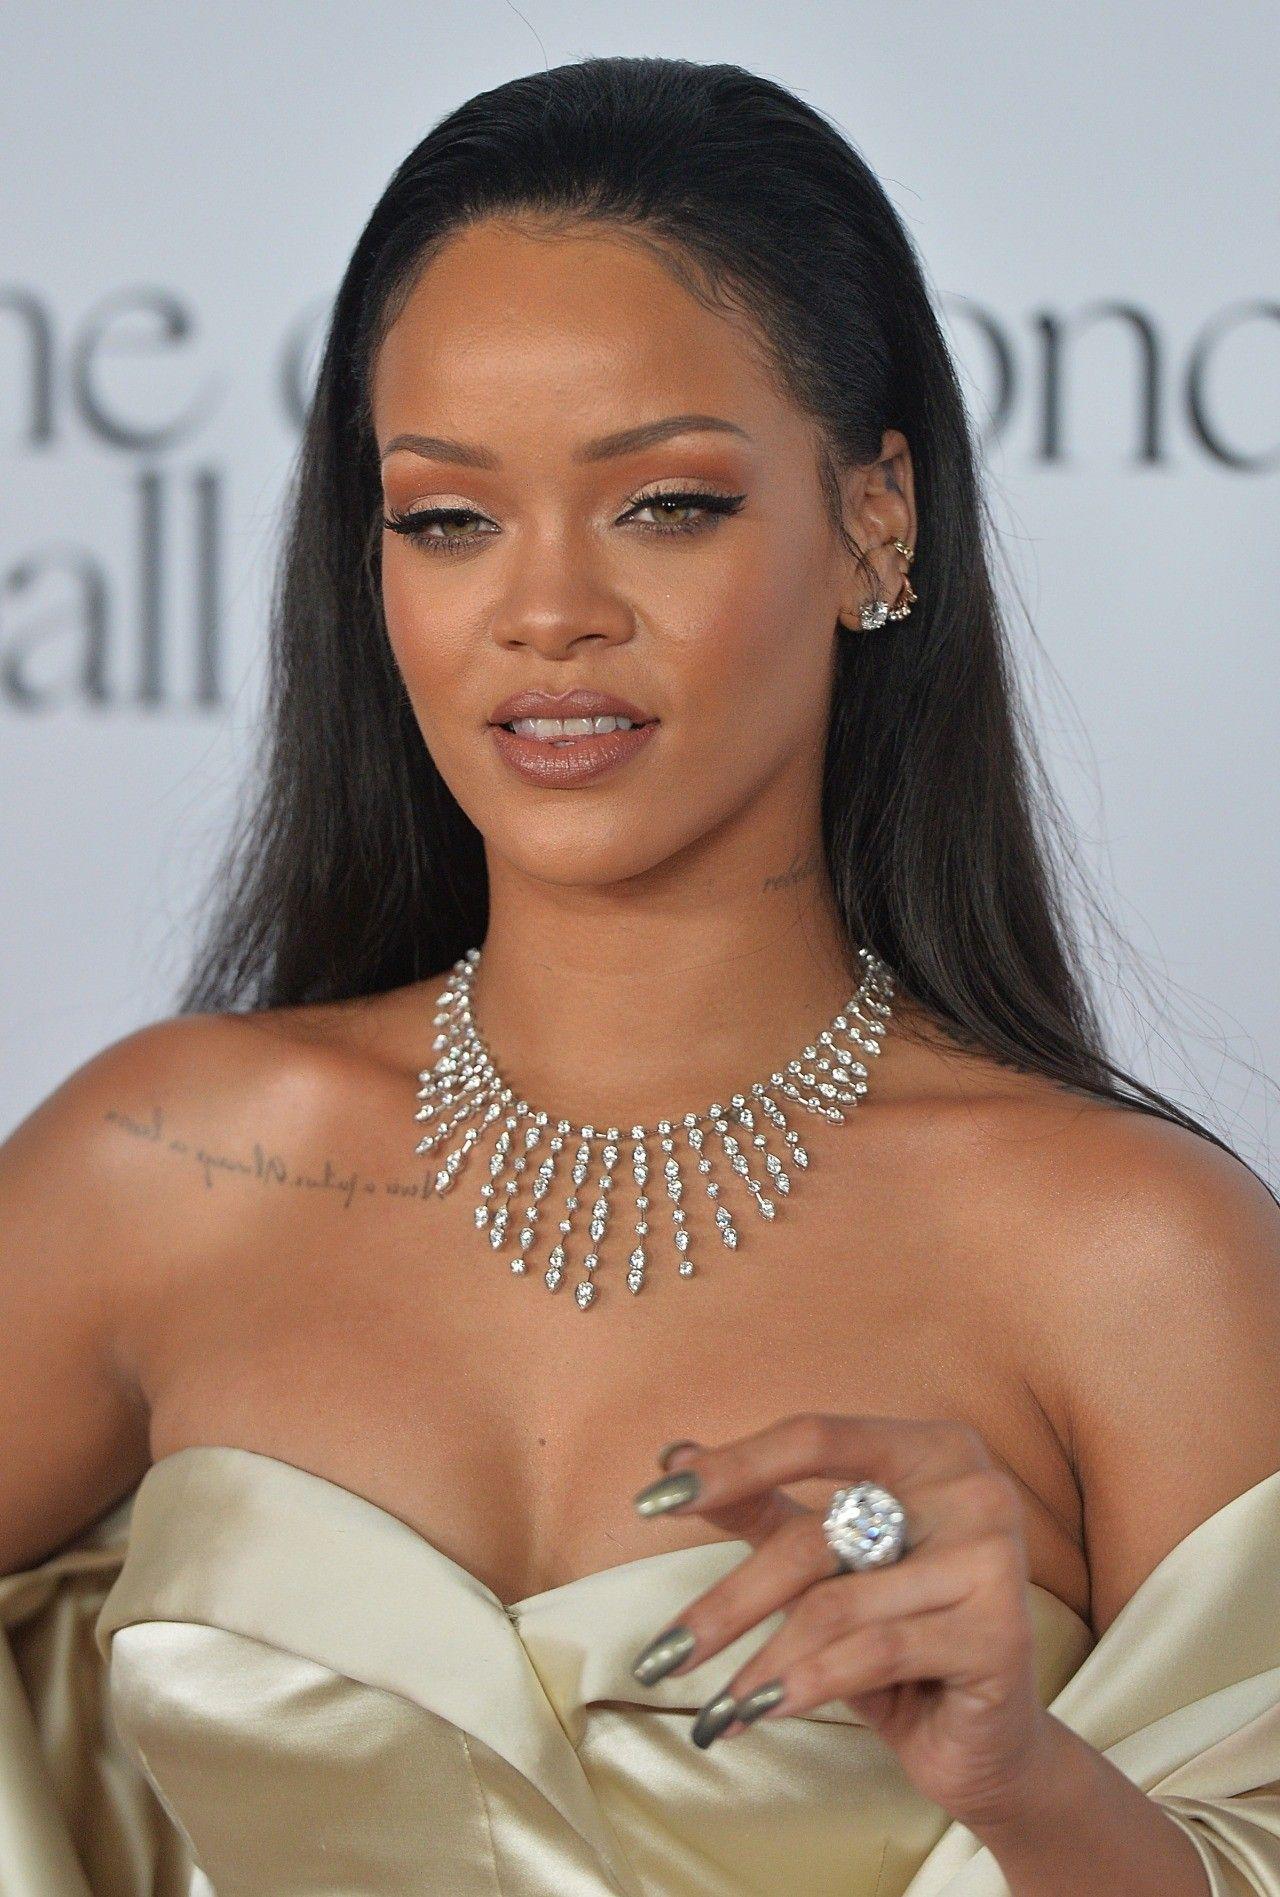 Pin de J em Rihanna Estilo zendaya